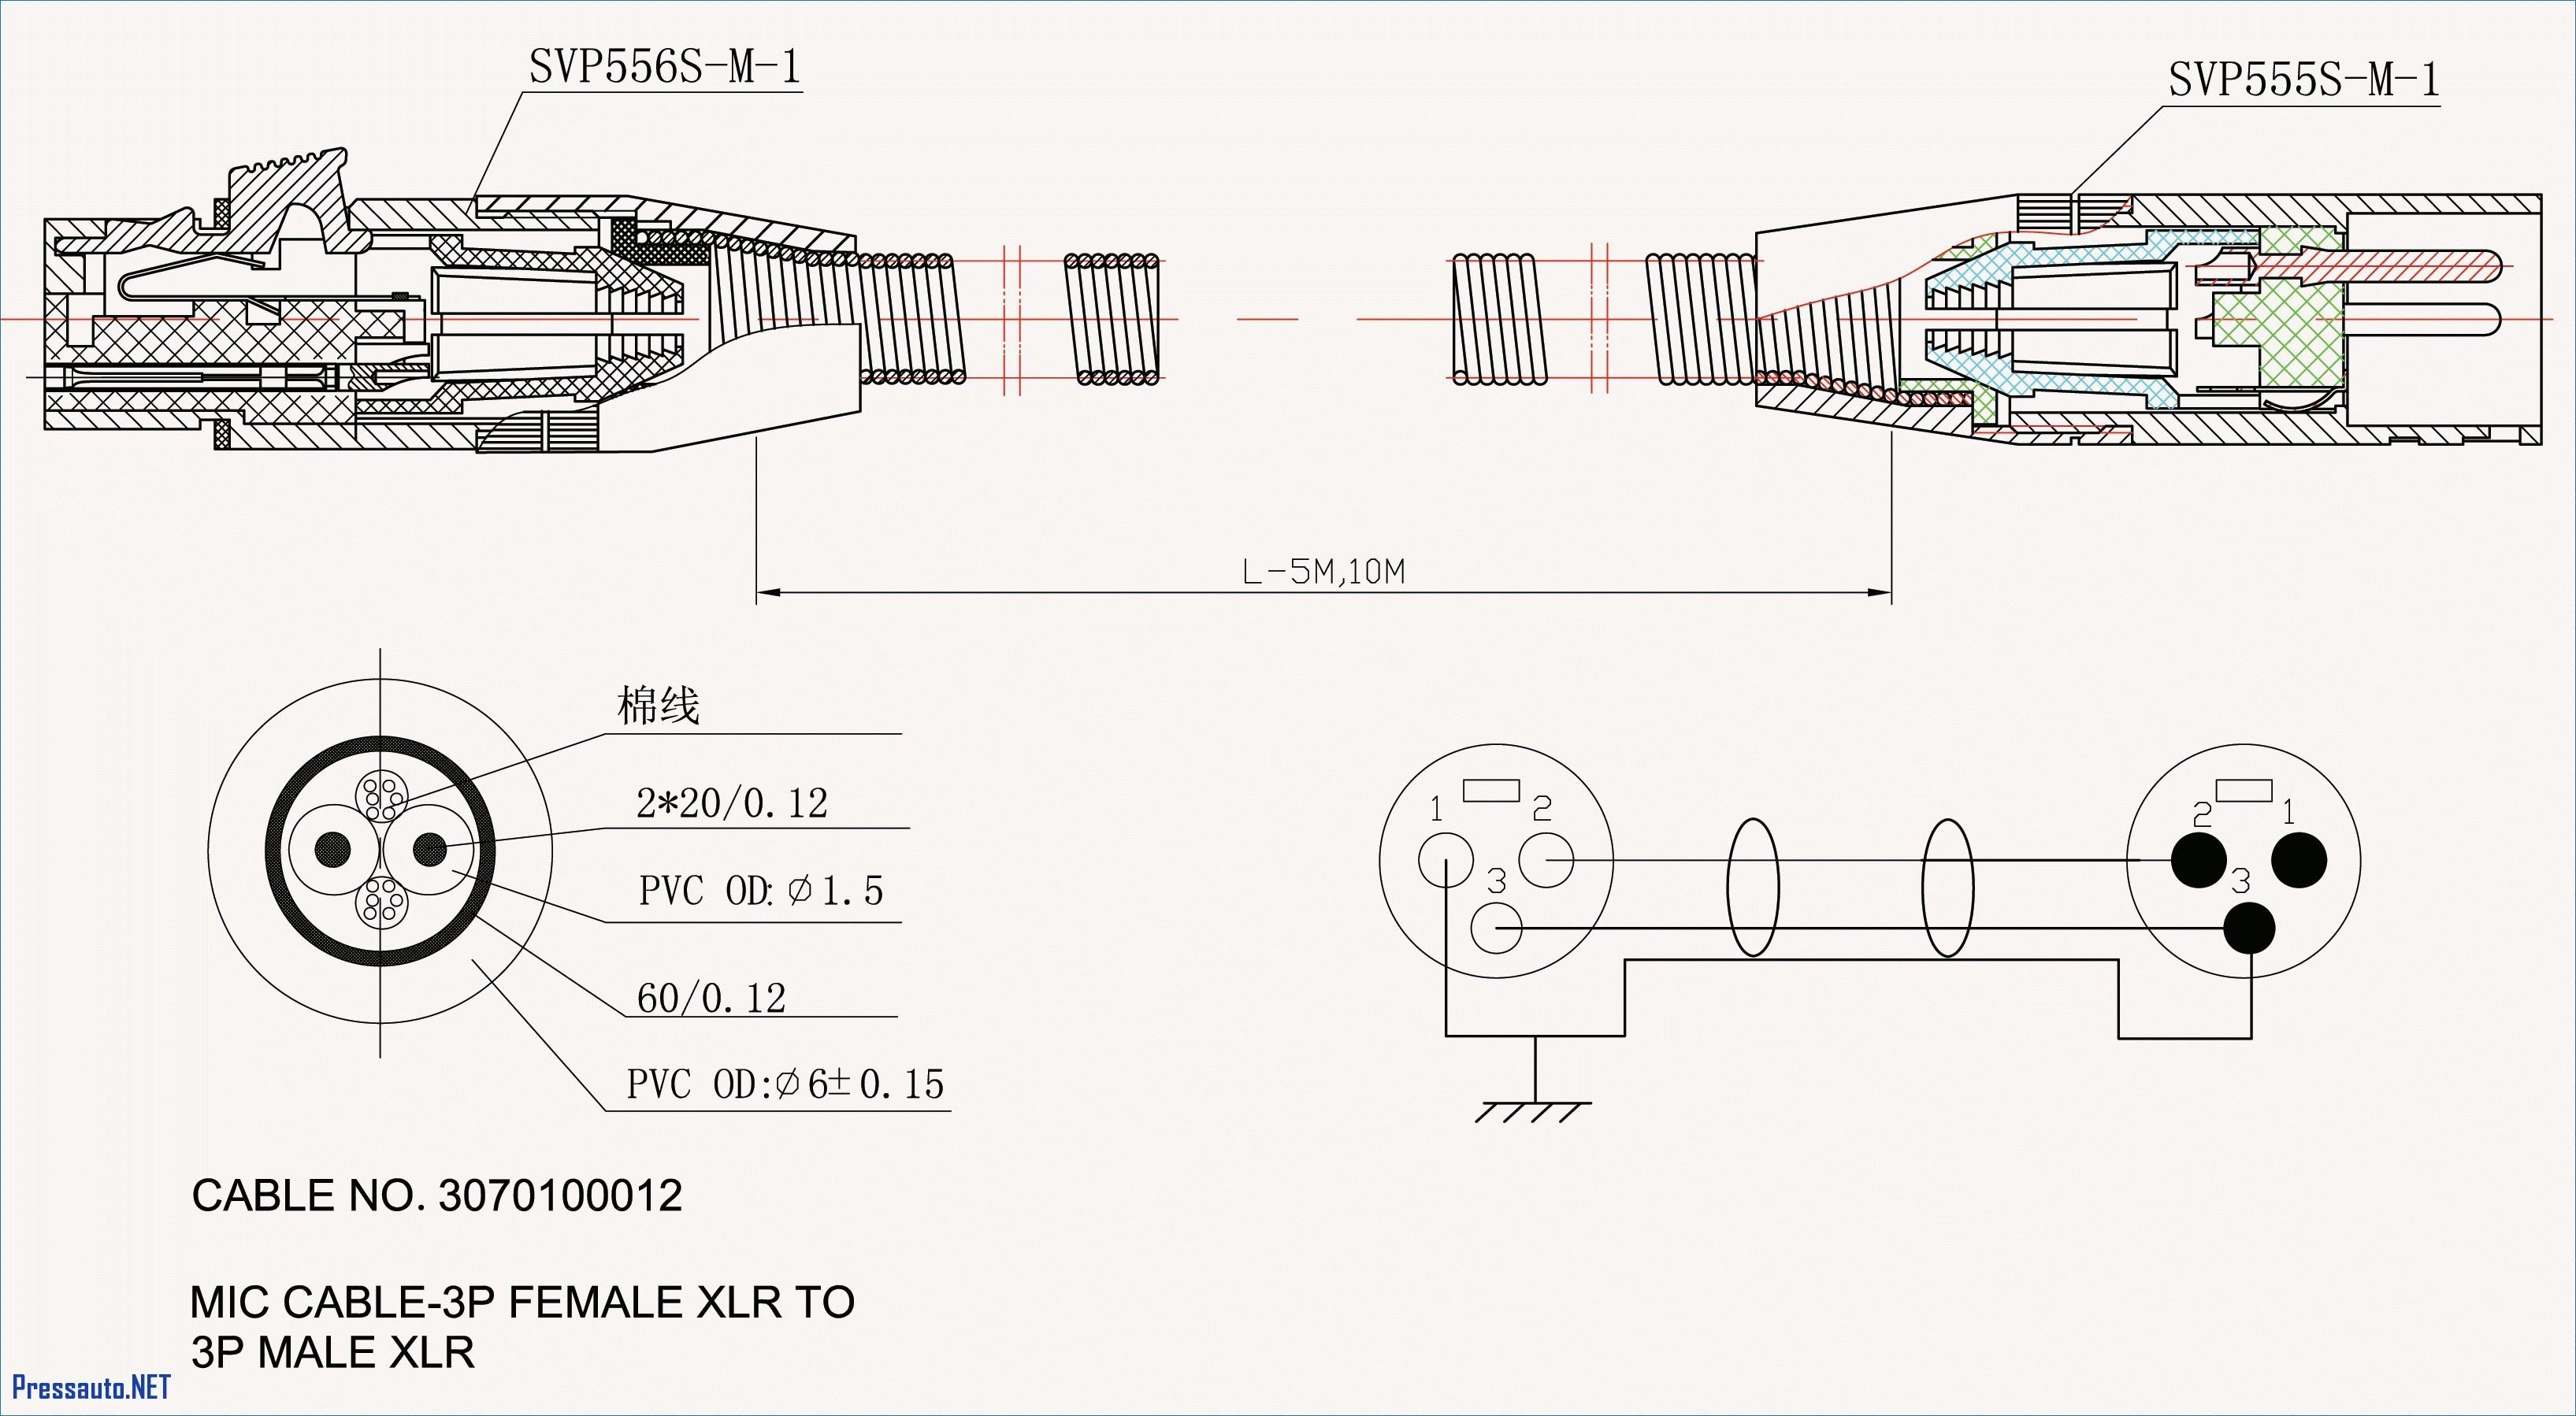 Electrical Wiring Diagram Pdf Valid Trailer Wiring Diagram Australia Pdf New Wiring Male Plug Australia